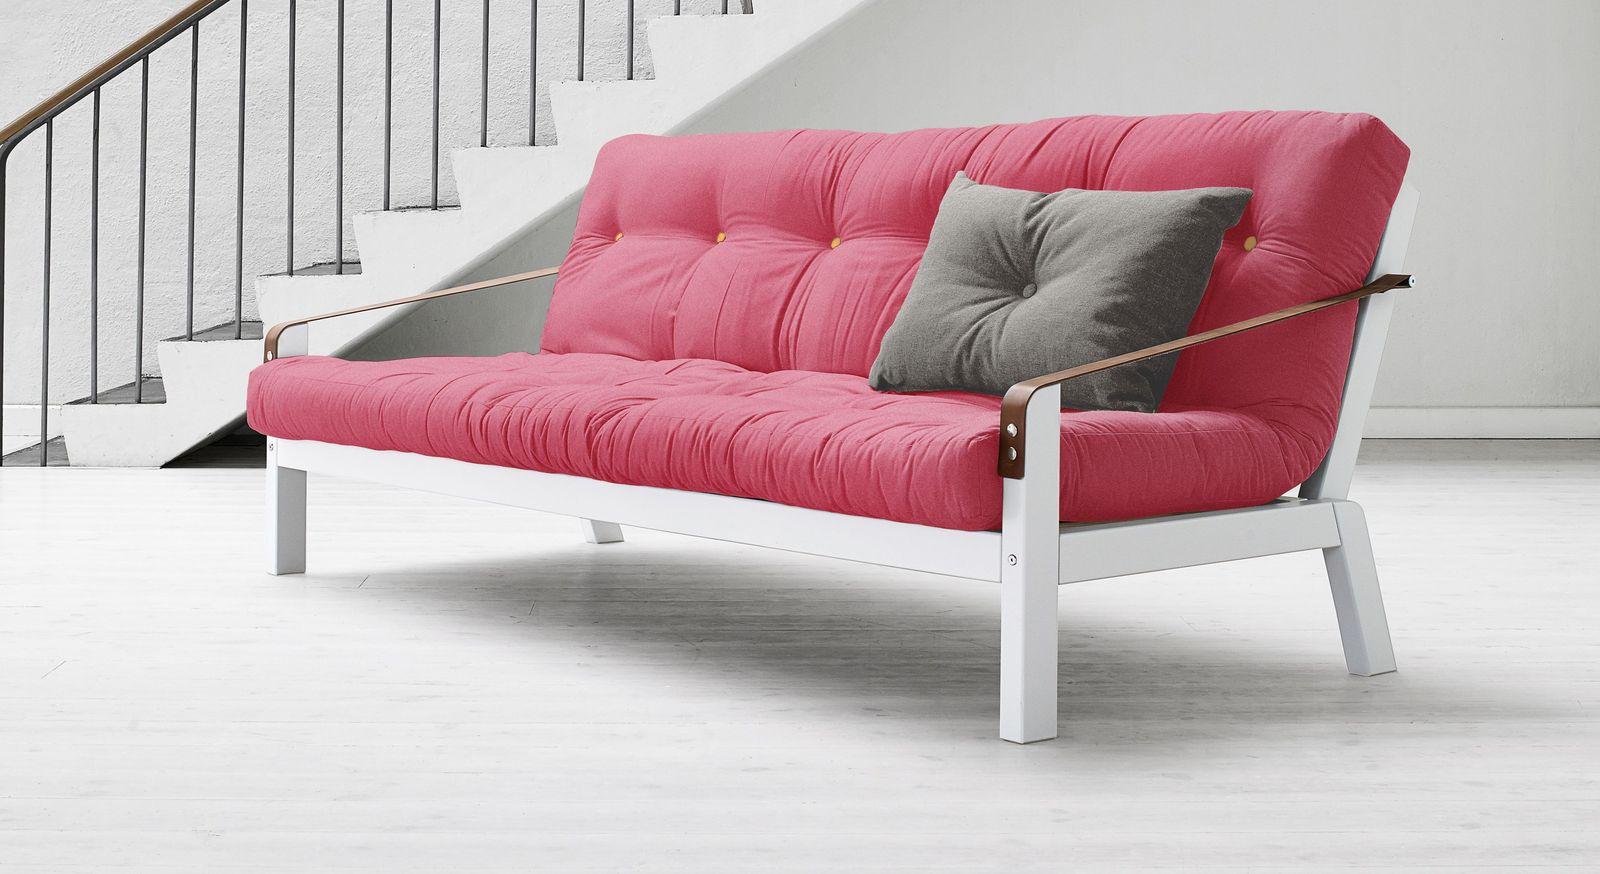 Farbenfrohes Futonsofa Leonessa mit pinker Matratze